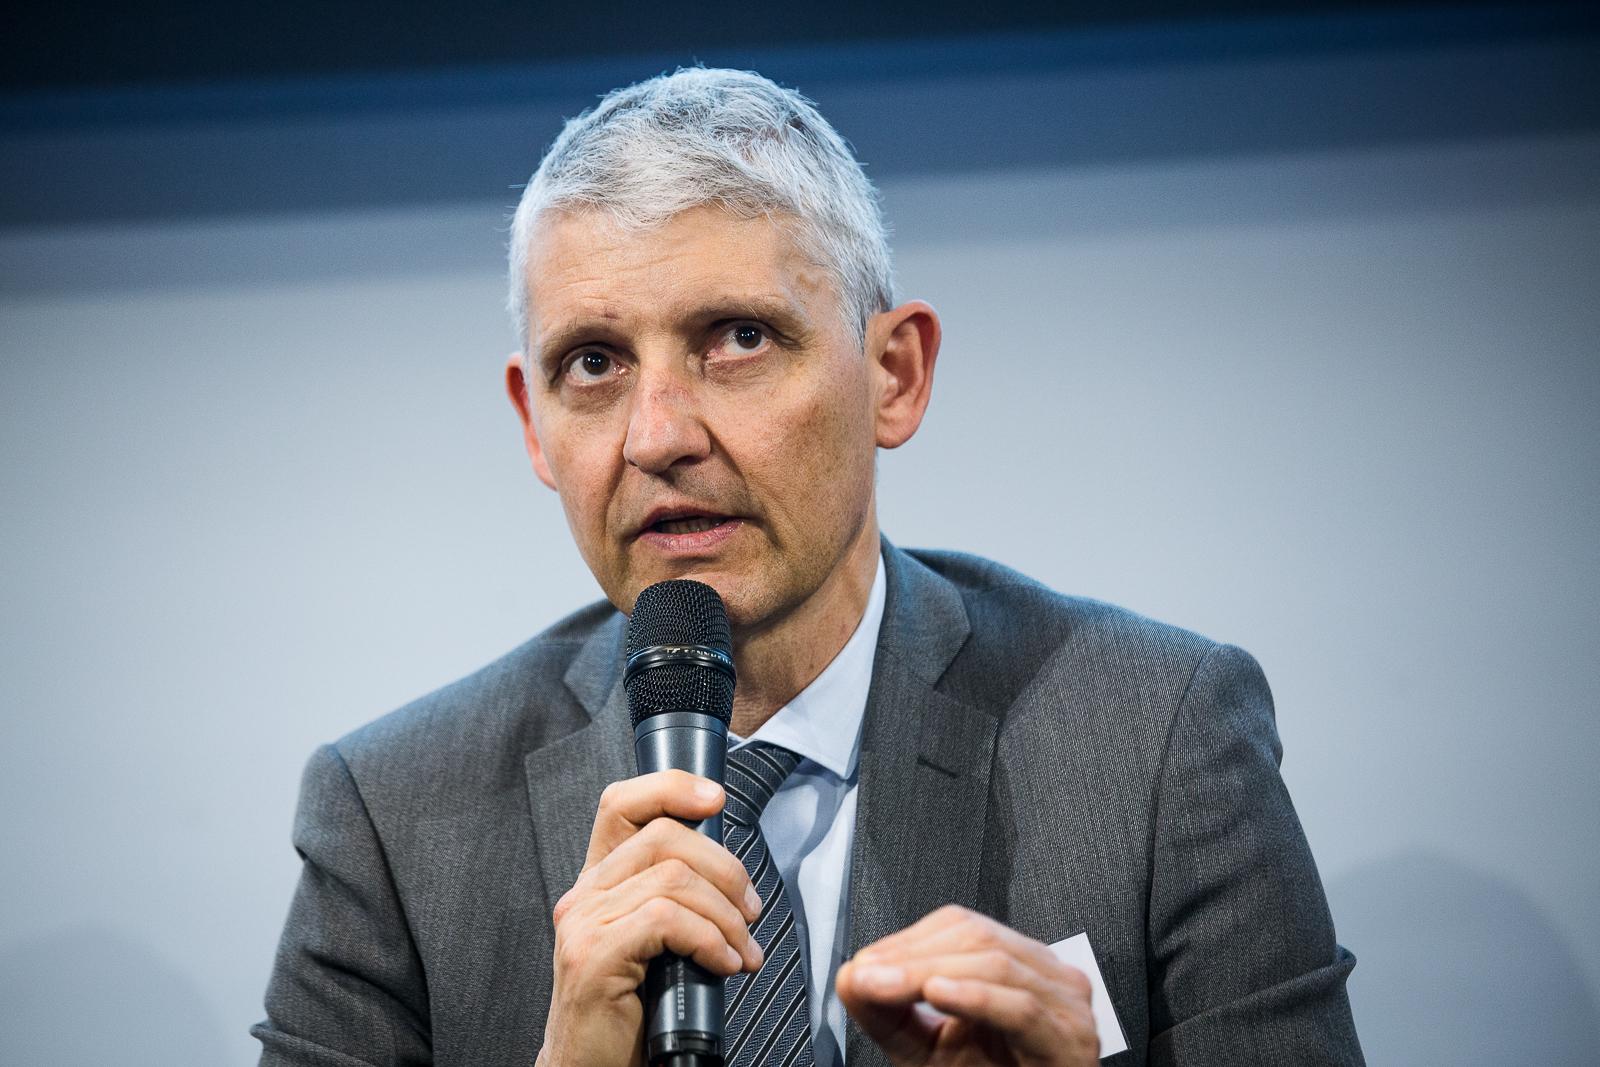 Olivier Gavalda (Crédit Agricole d'Île-de-France) - IN BANQUE 2018 - Crédit photo : Guillermo Gomez